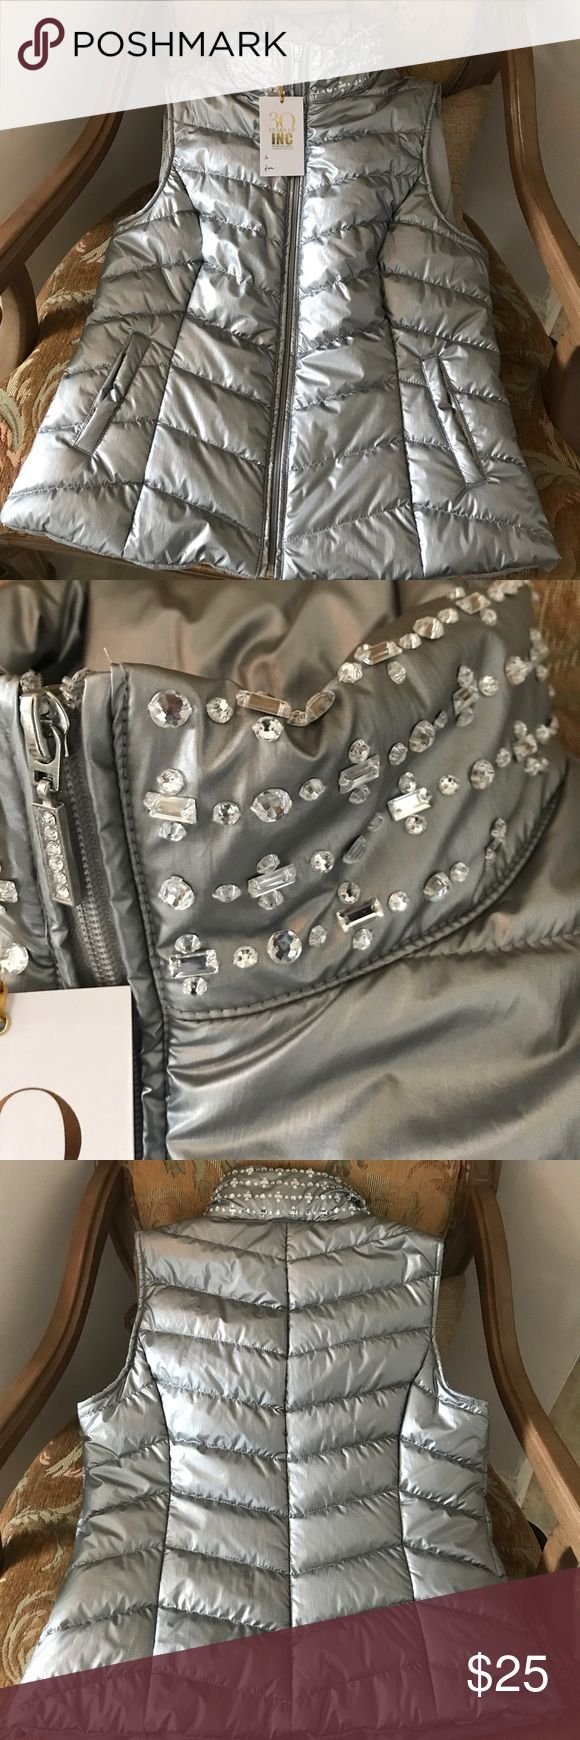 INC SILVER VEST Never worn. Tag still attached. INC International Concepts Jackets & Coats Vests